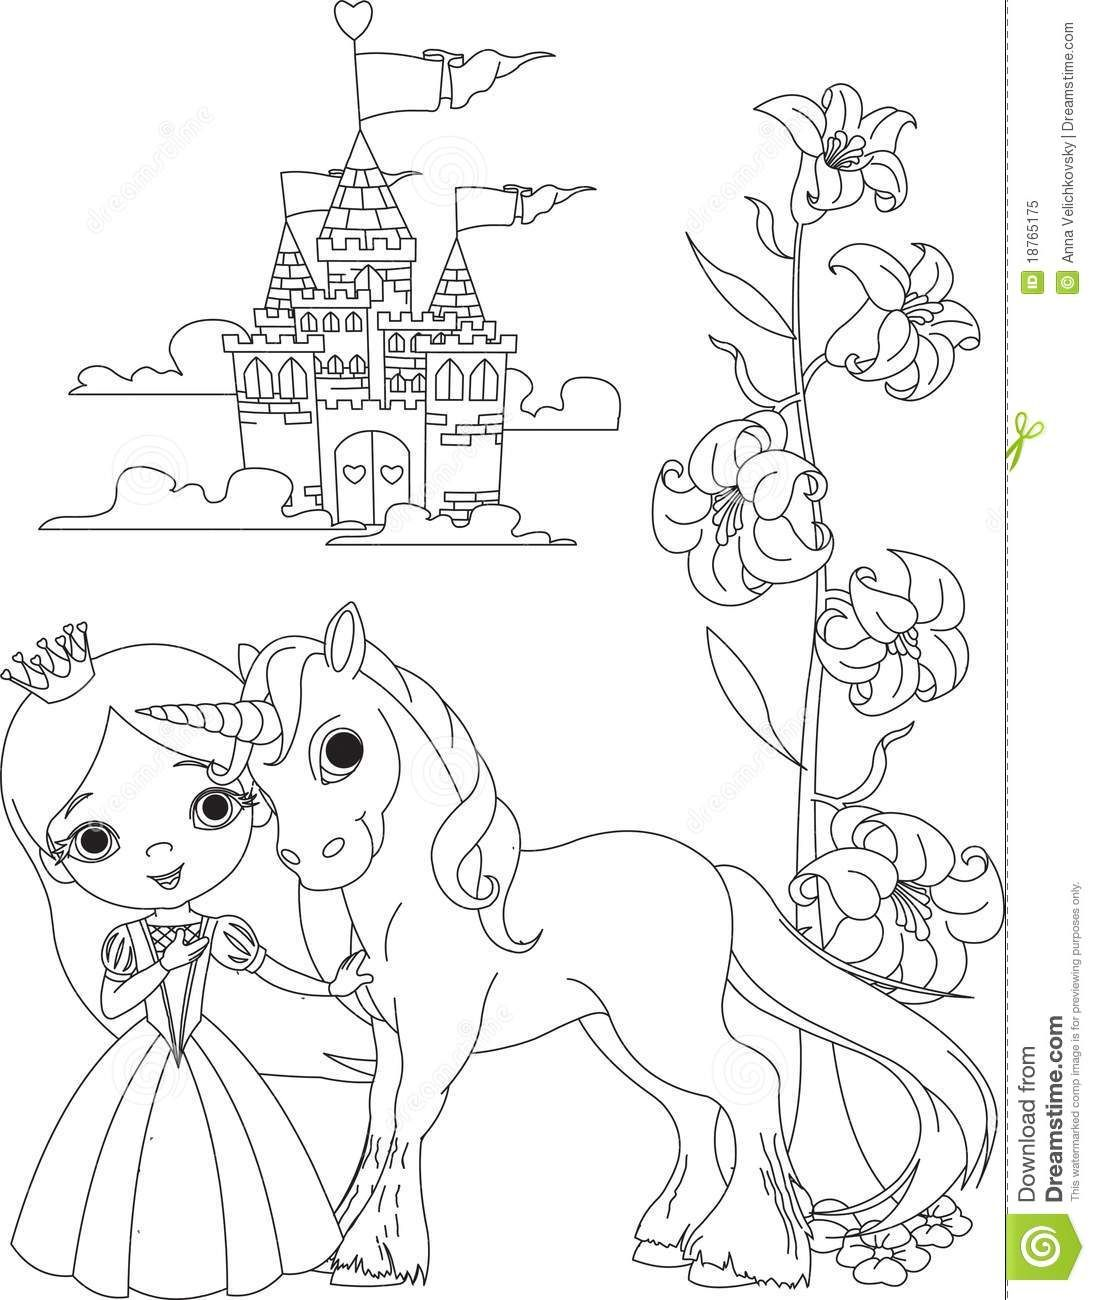 unicorn coloring pages   Google Search   Coloriage princesse ...